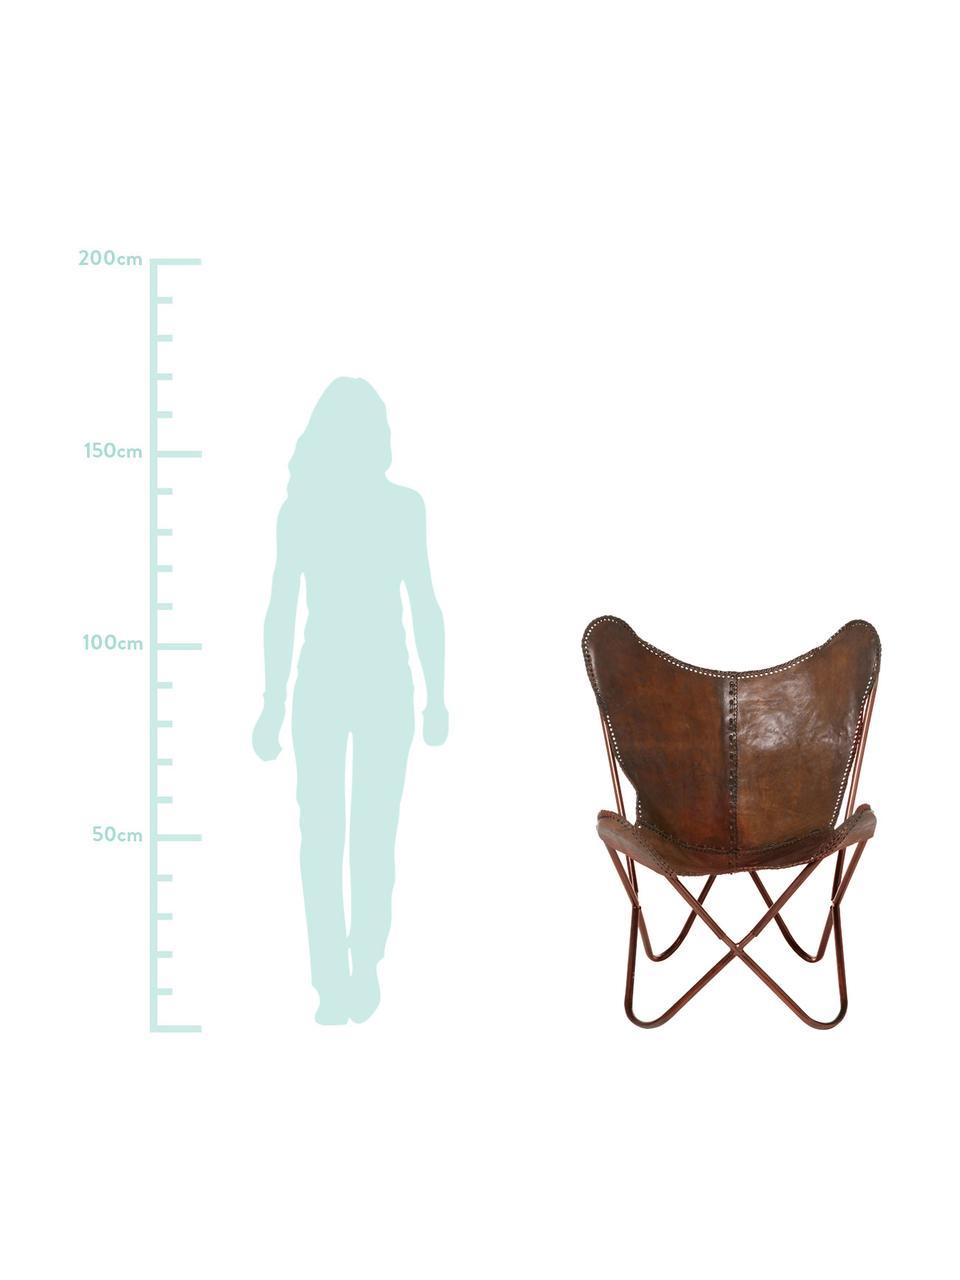 Poltrona in pelle Butterfly, Rivestimento: pelle bovina, Struttura: metallo verniciato, Marrone, Larg. 80 x Alt. 87 cm